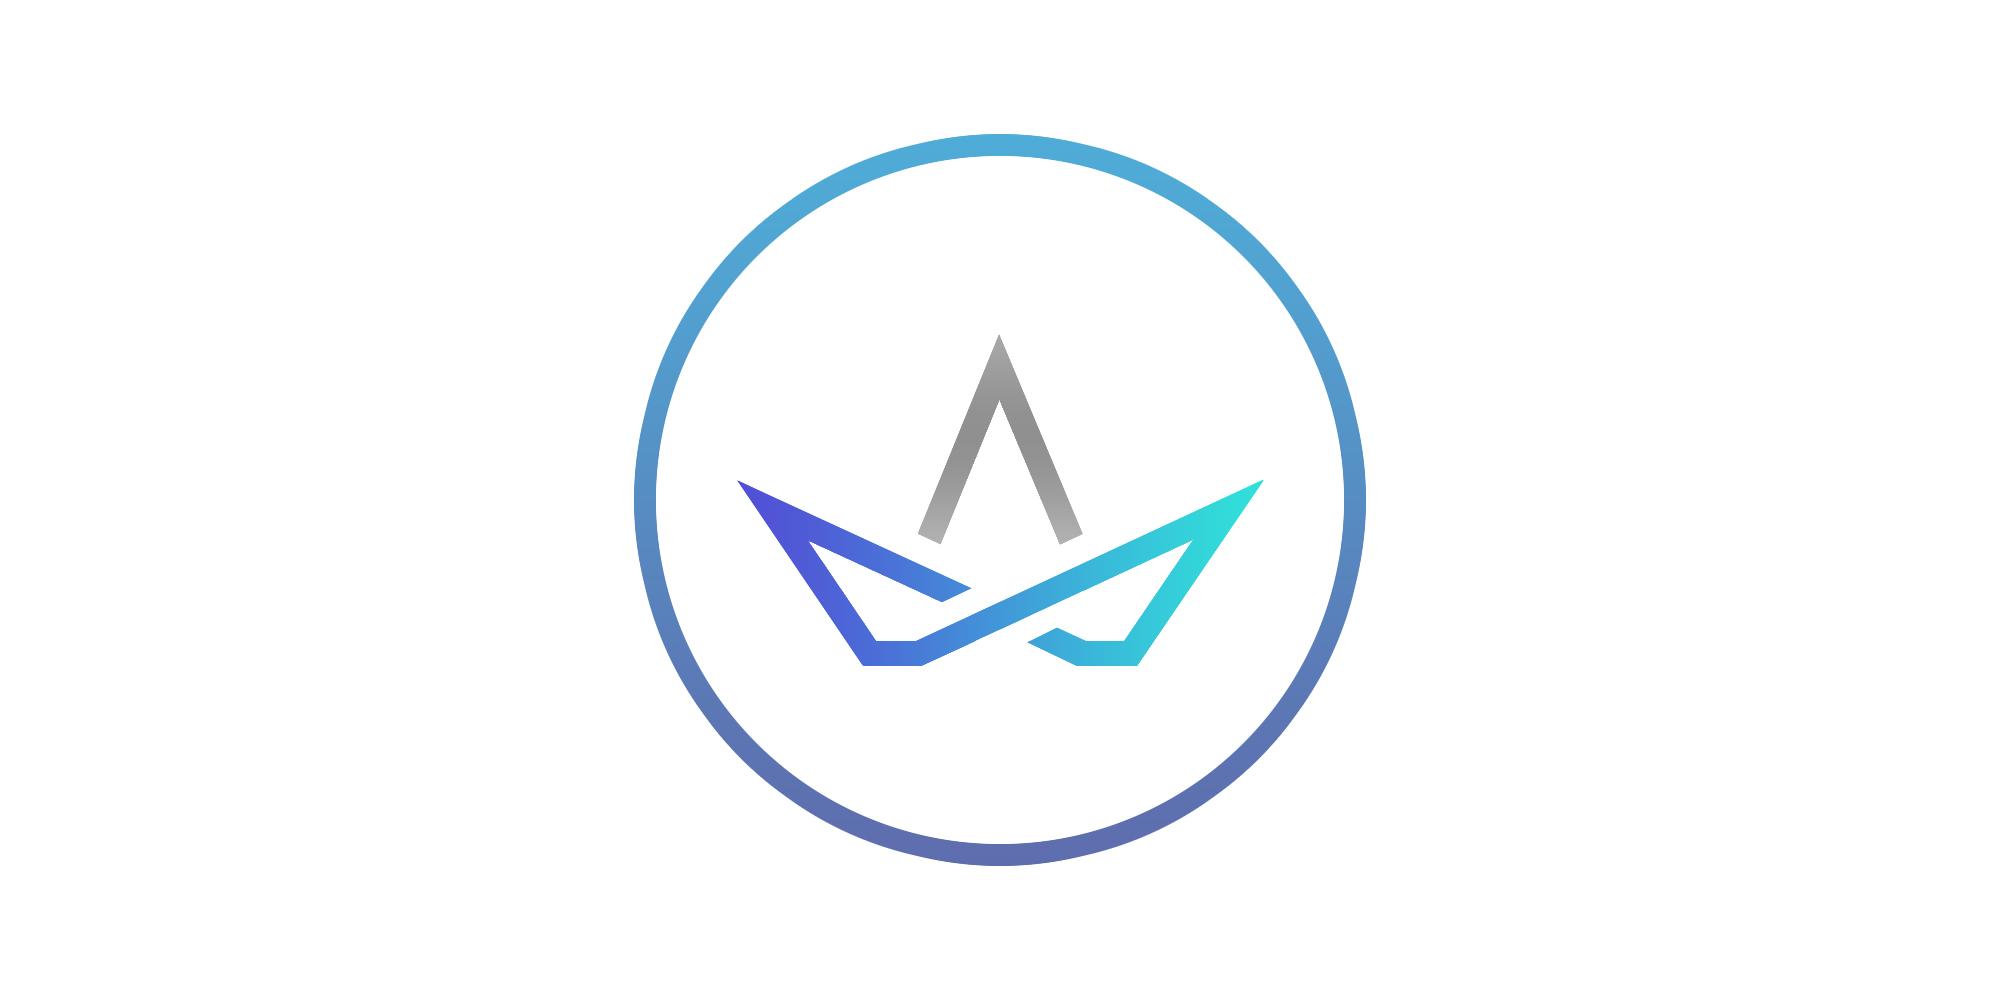 https://tunedupmedia.com/wp-content/plugins/kingcomposer/assets/images/get_start.jpg